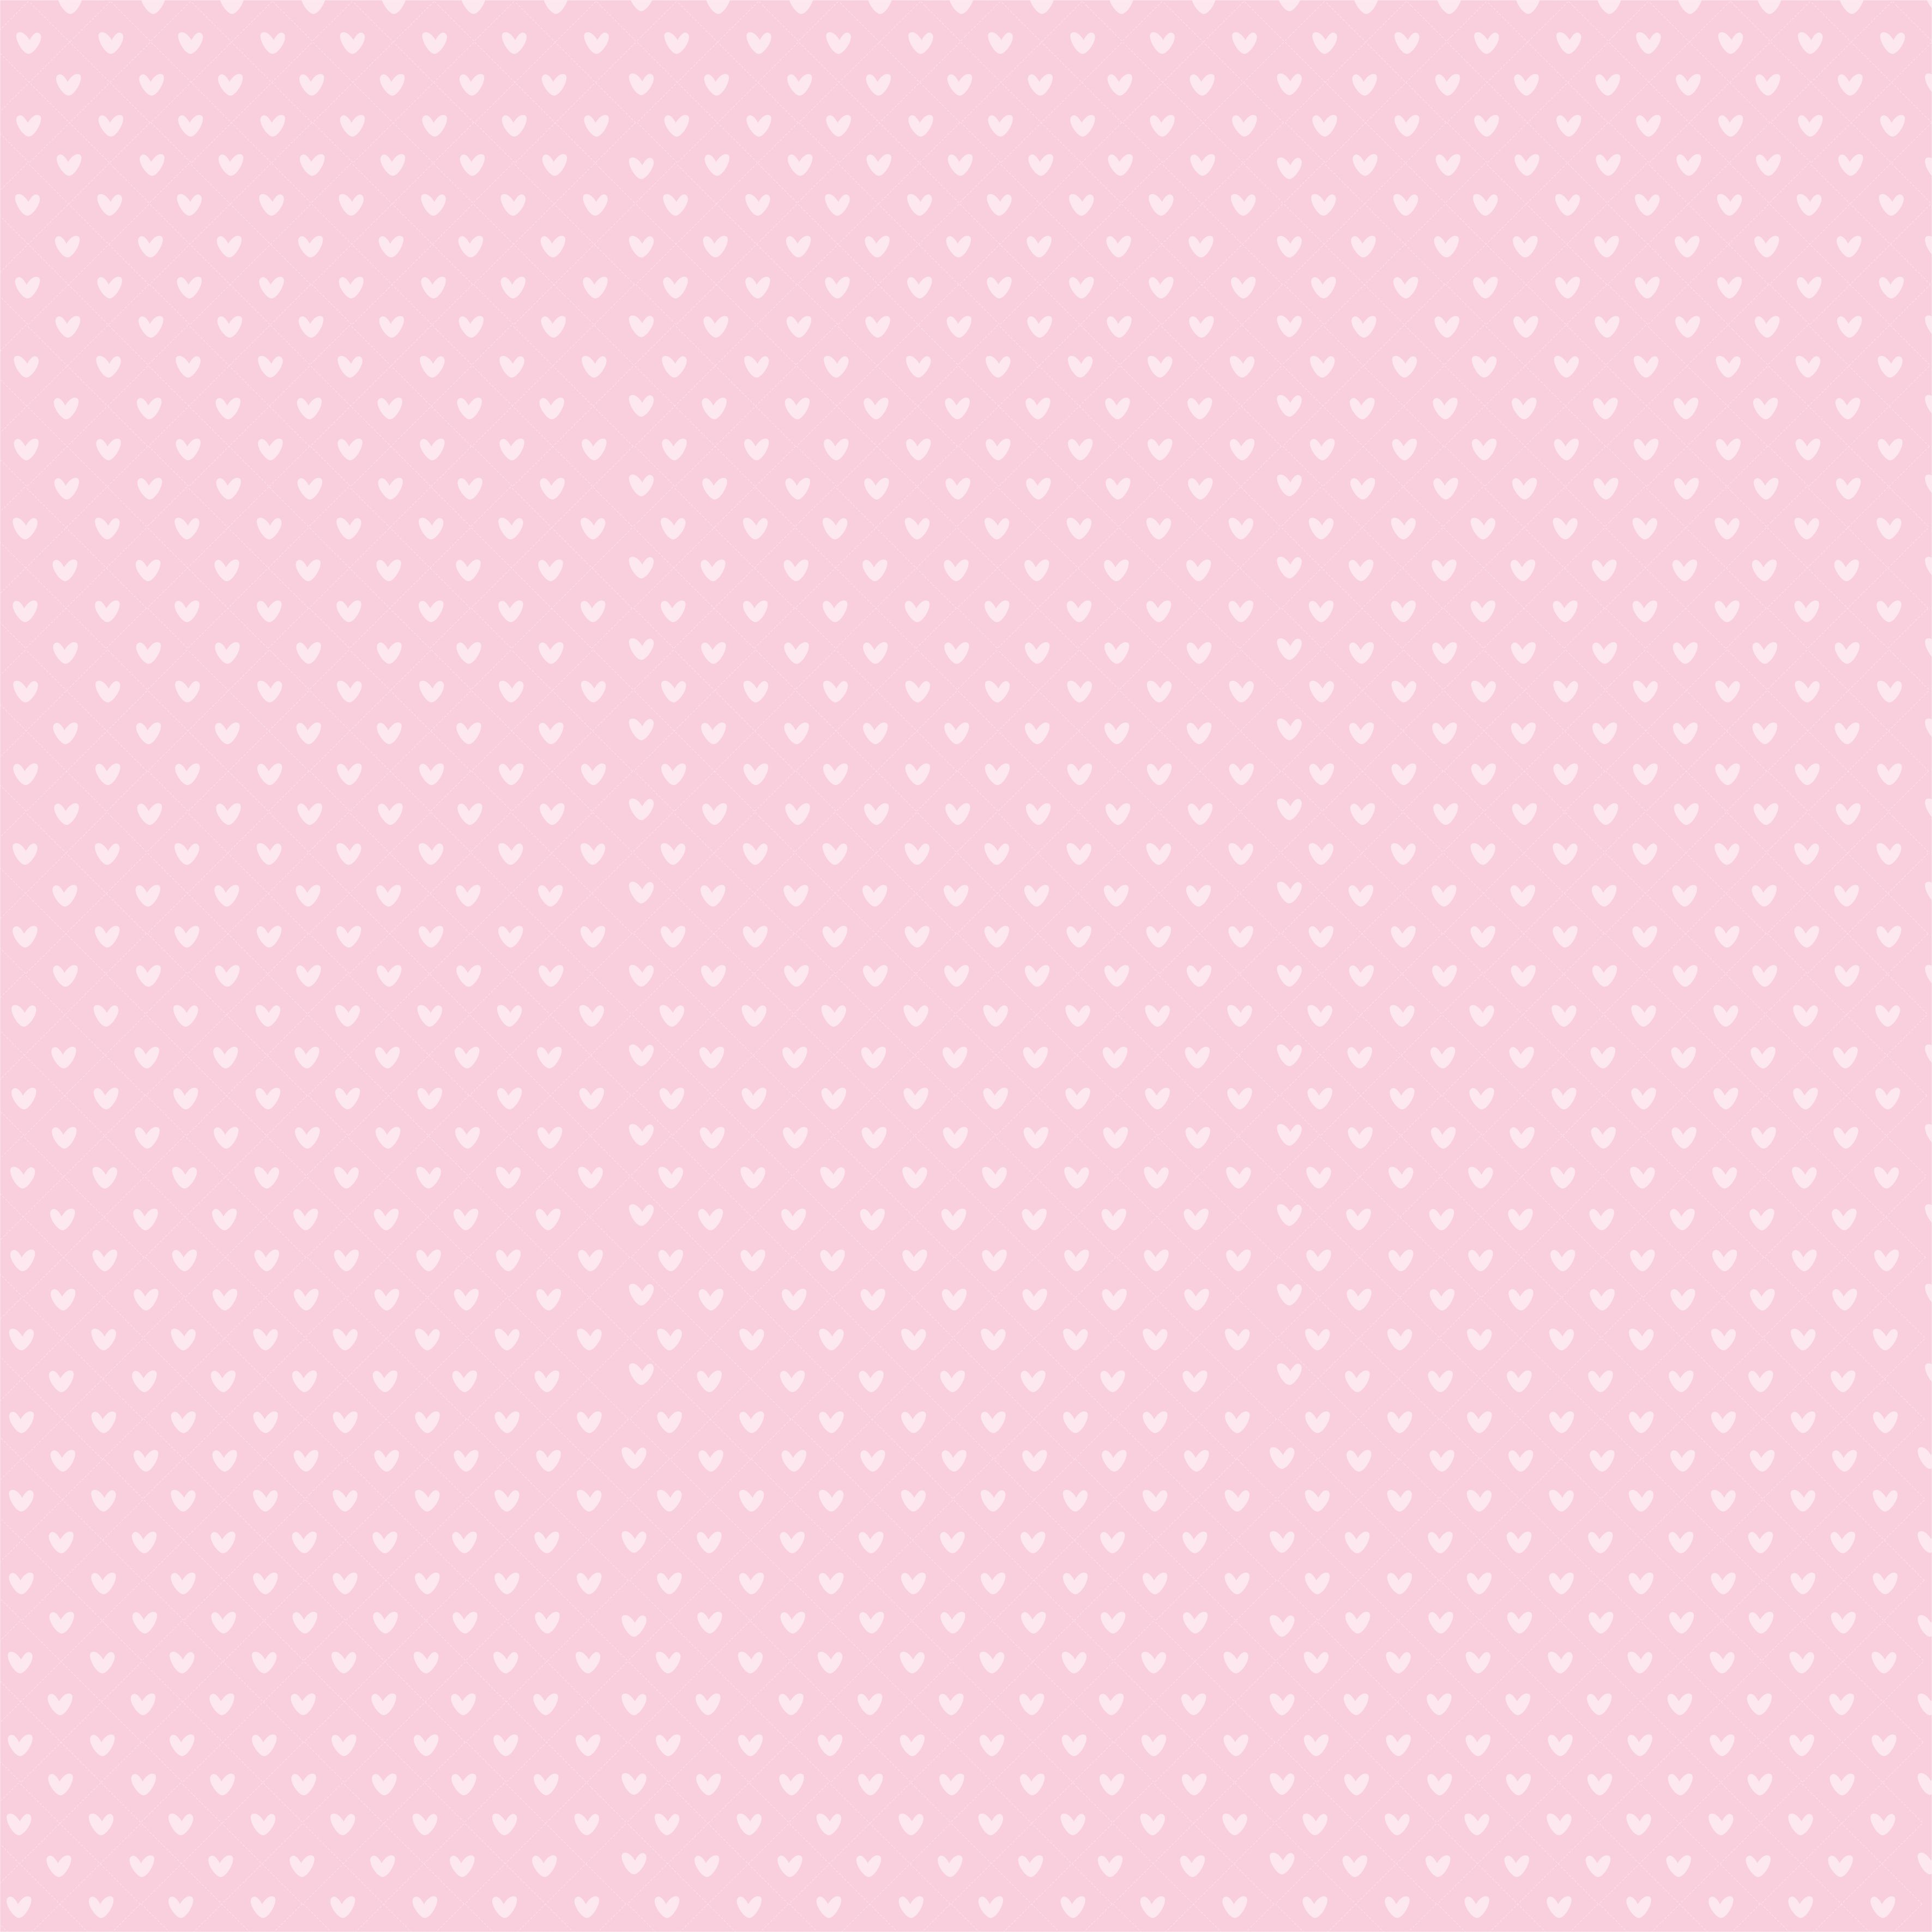 papel digital chuva de amor menina 7